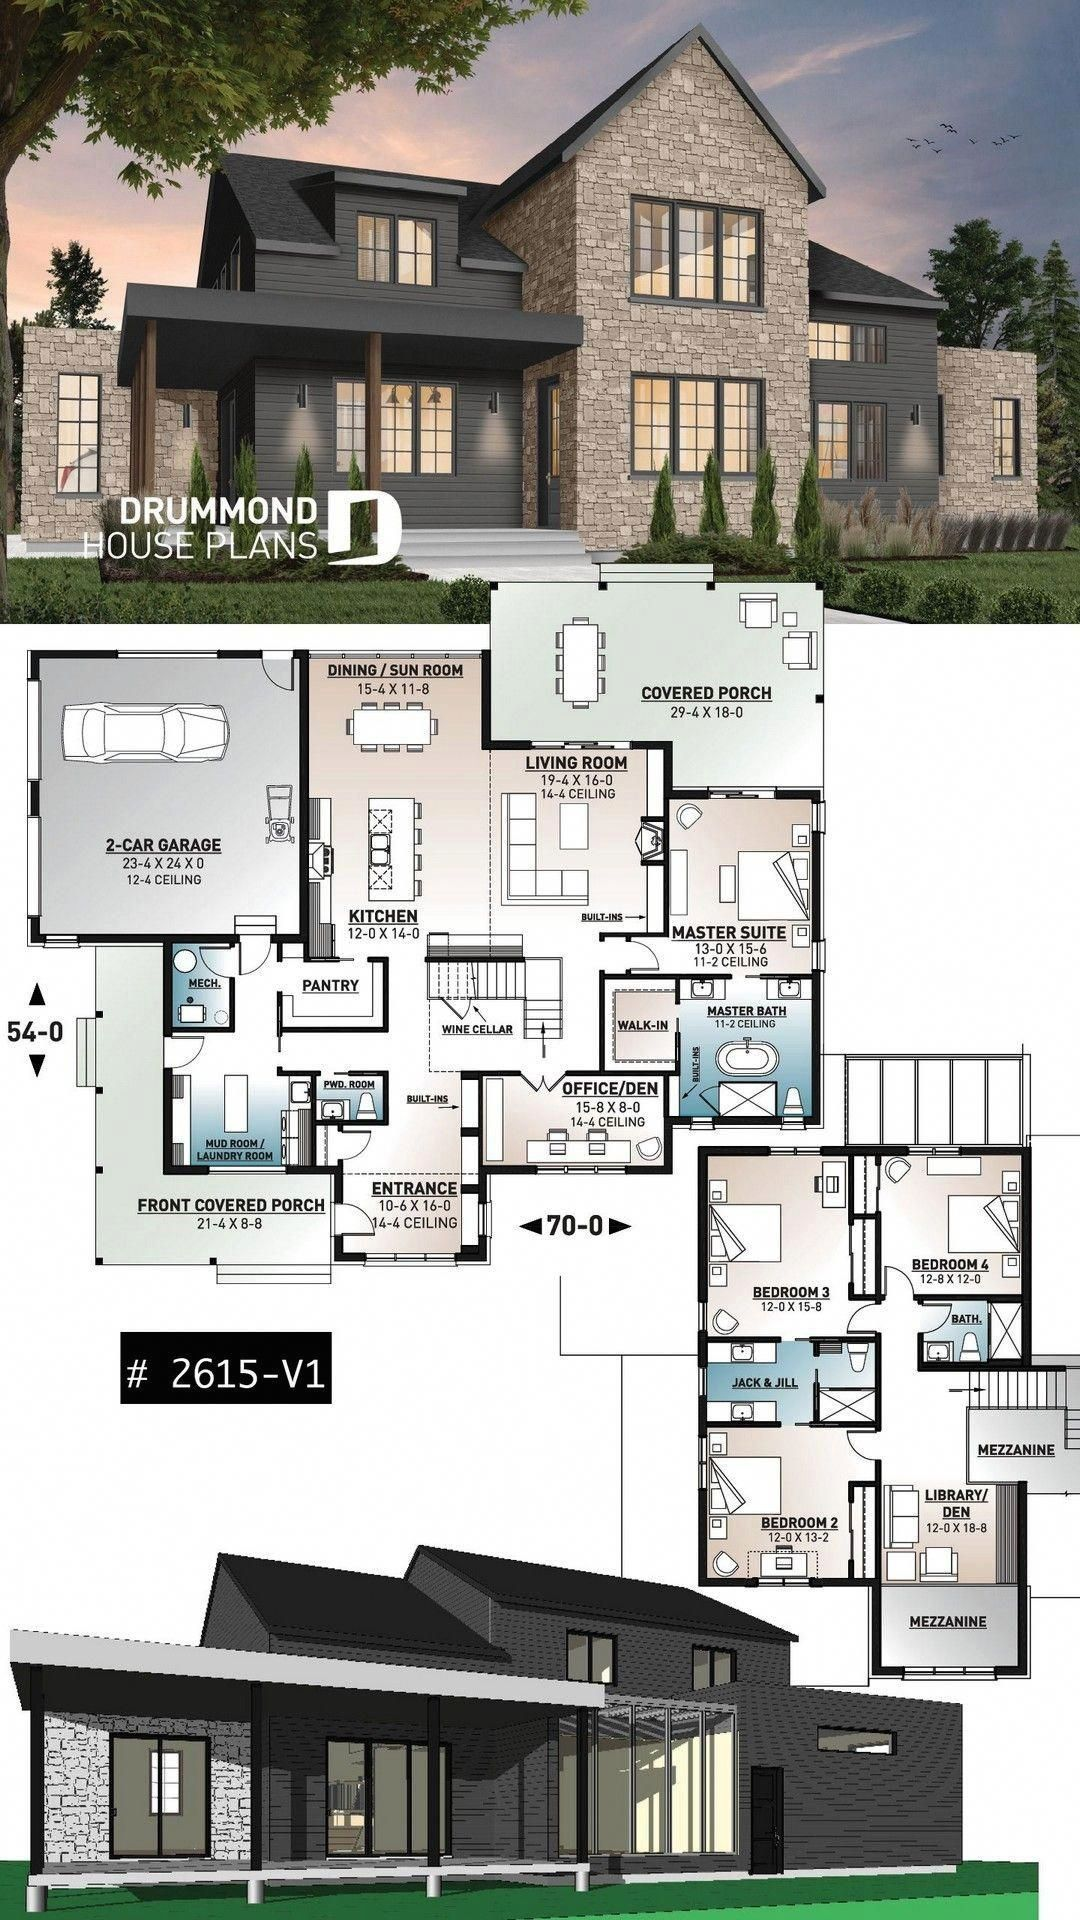 25 Awesome Minimalist Living Room Decor Ideas In 2020 Modern Farmhouse Plans Farmhouse Plans House Plans Farmhouse